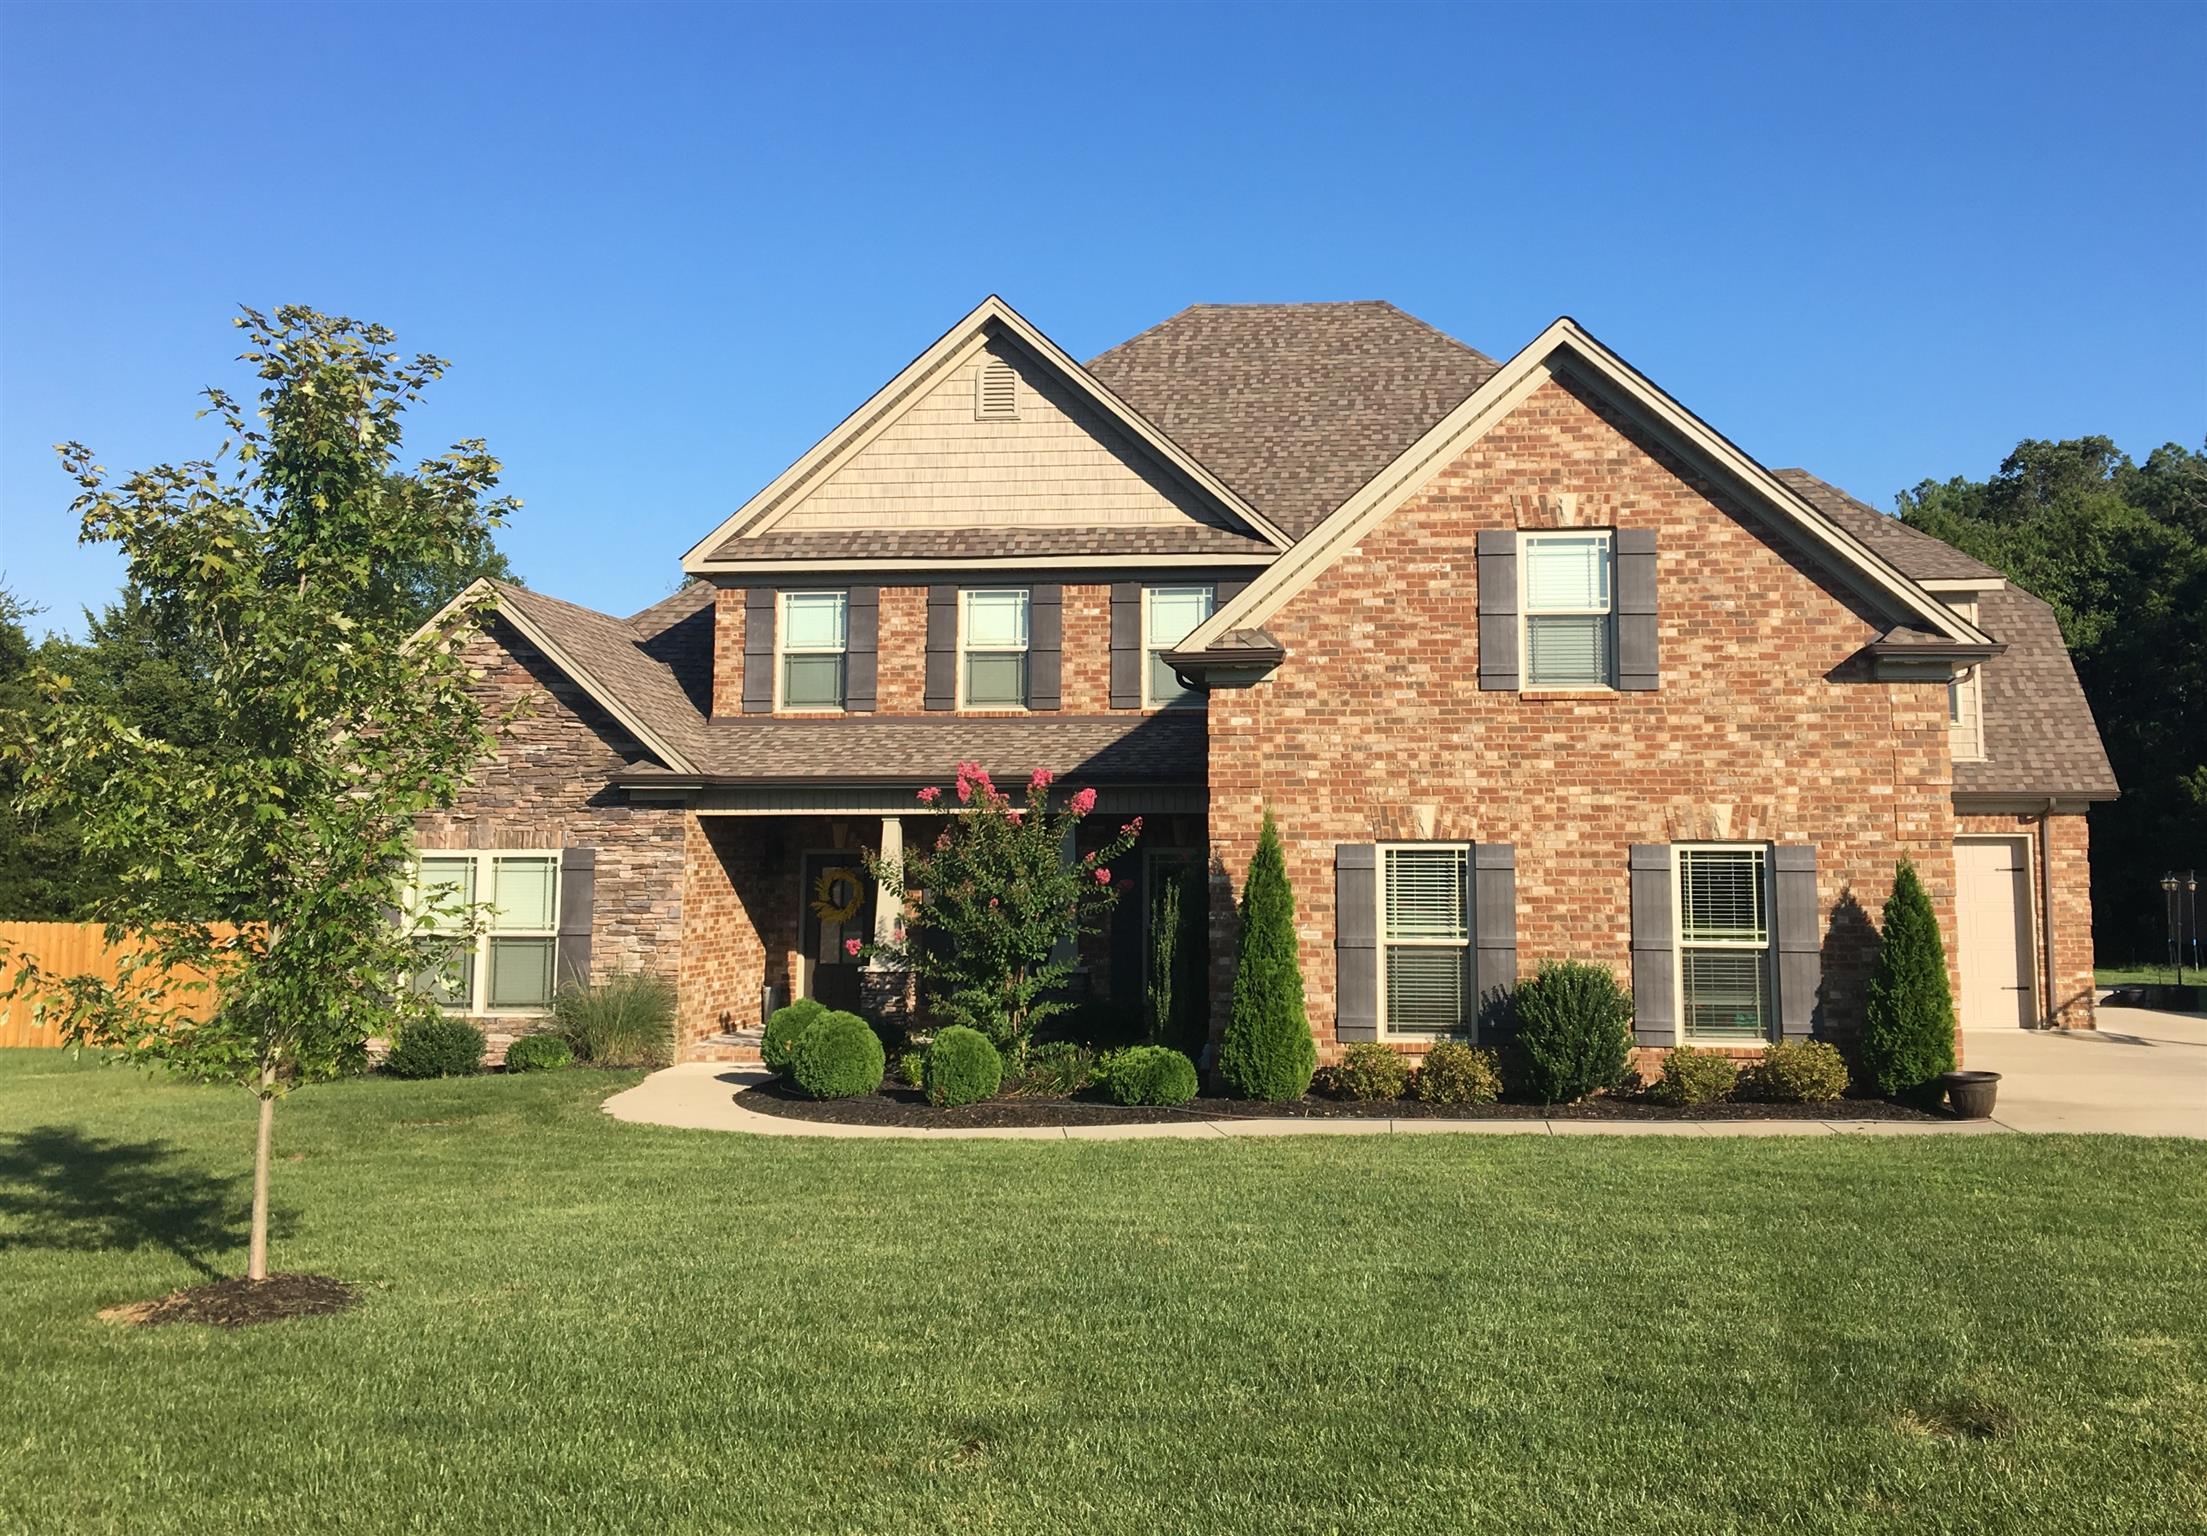 8013 Shelly Plum Dr, Murfreesboro, TN 37128 - Murfreesboro, TN real estate listing